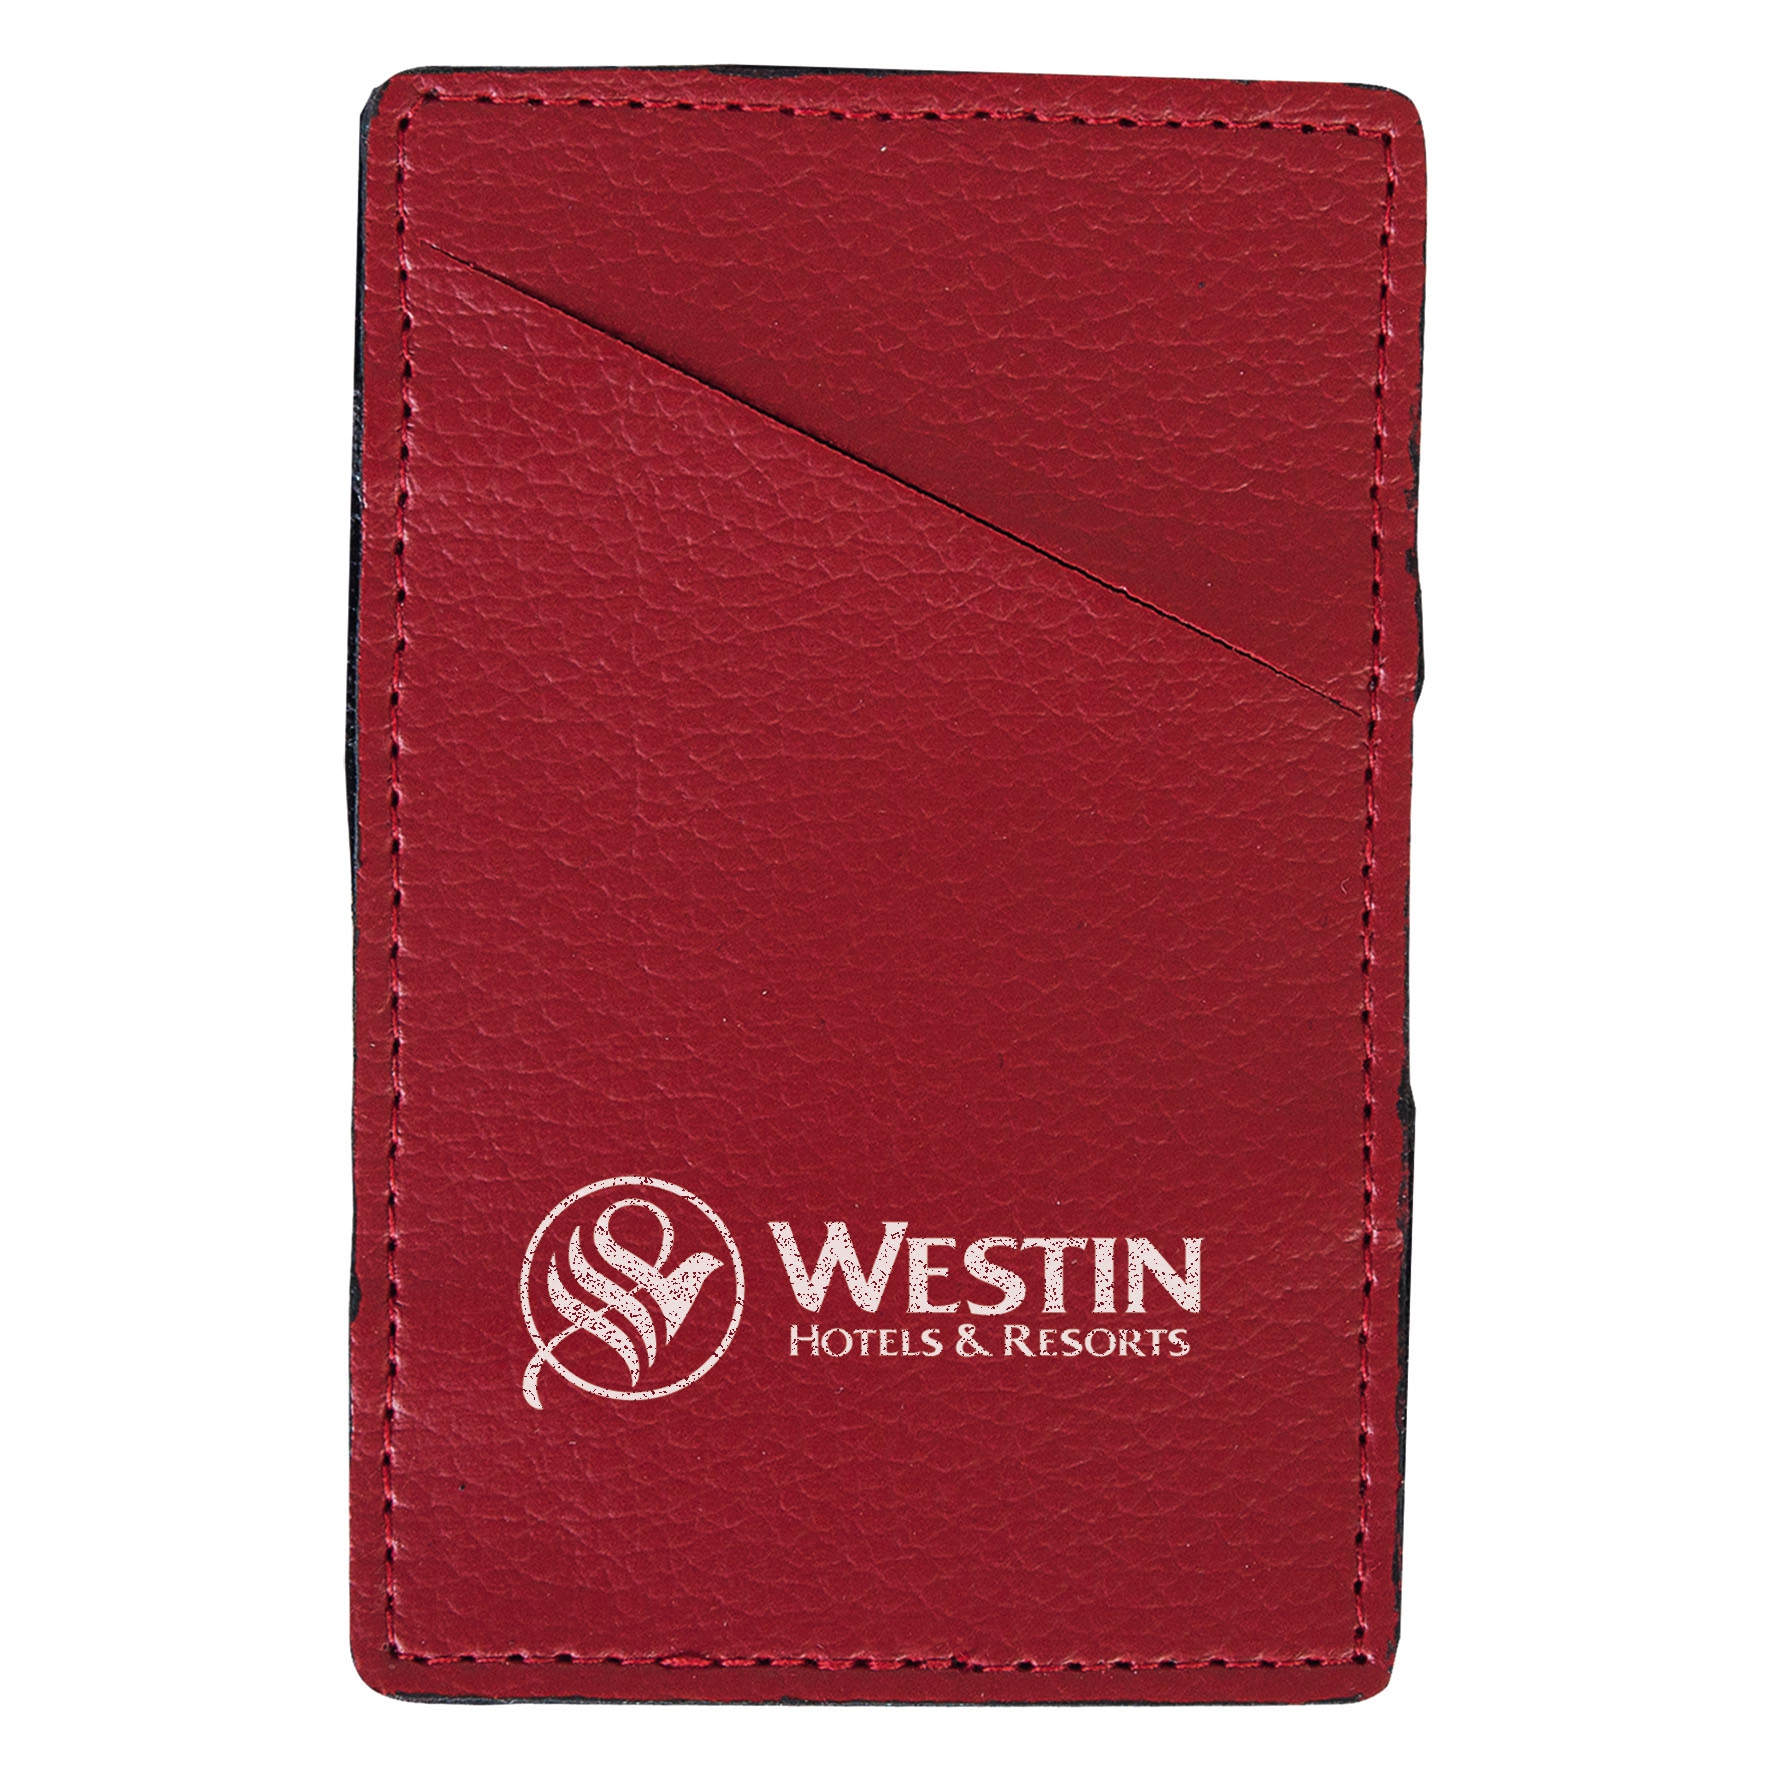 Goodies - Porte-cartes publicitaire Magic - rouge